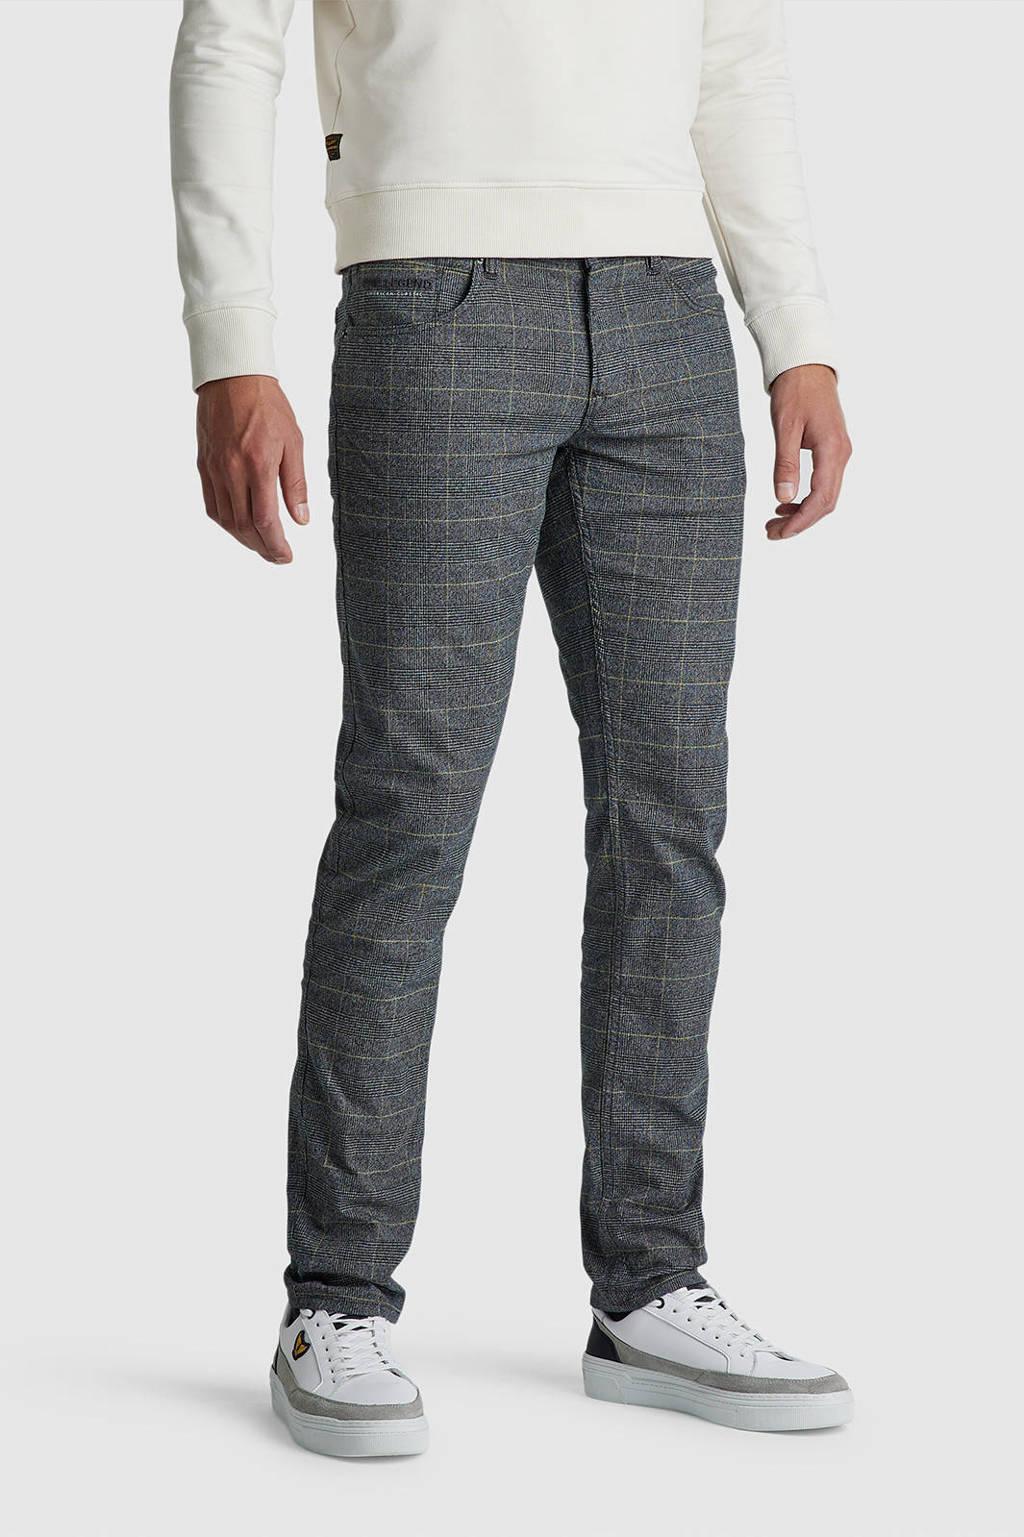 PME Legend regular straight fit jeans Nightflight 9079 grijs, 9079 Grijs